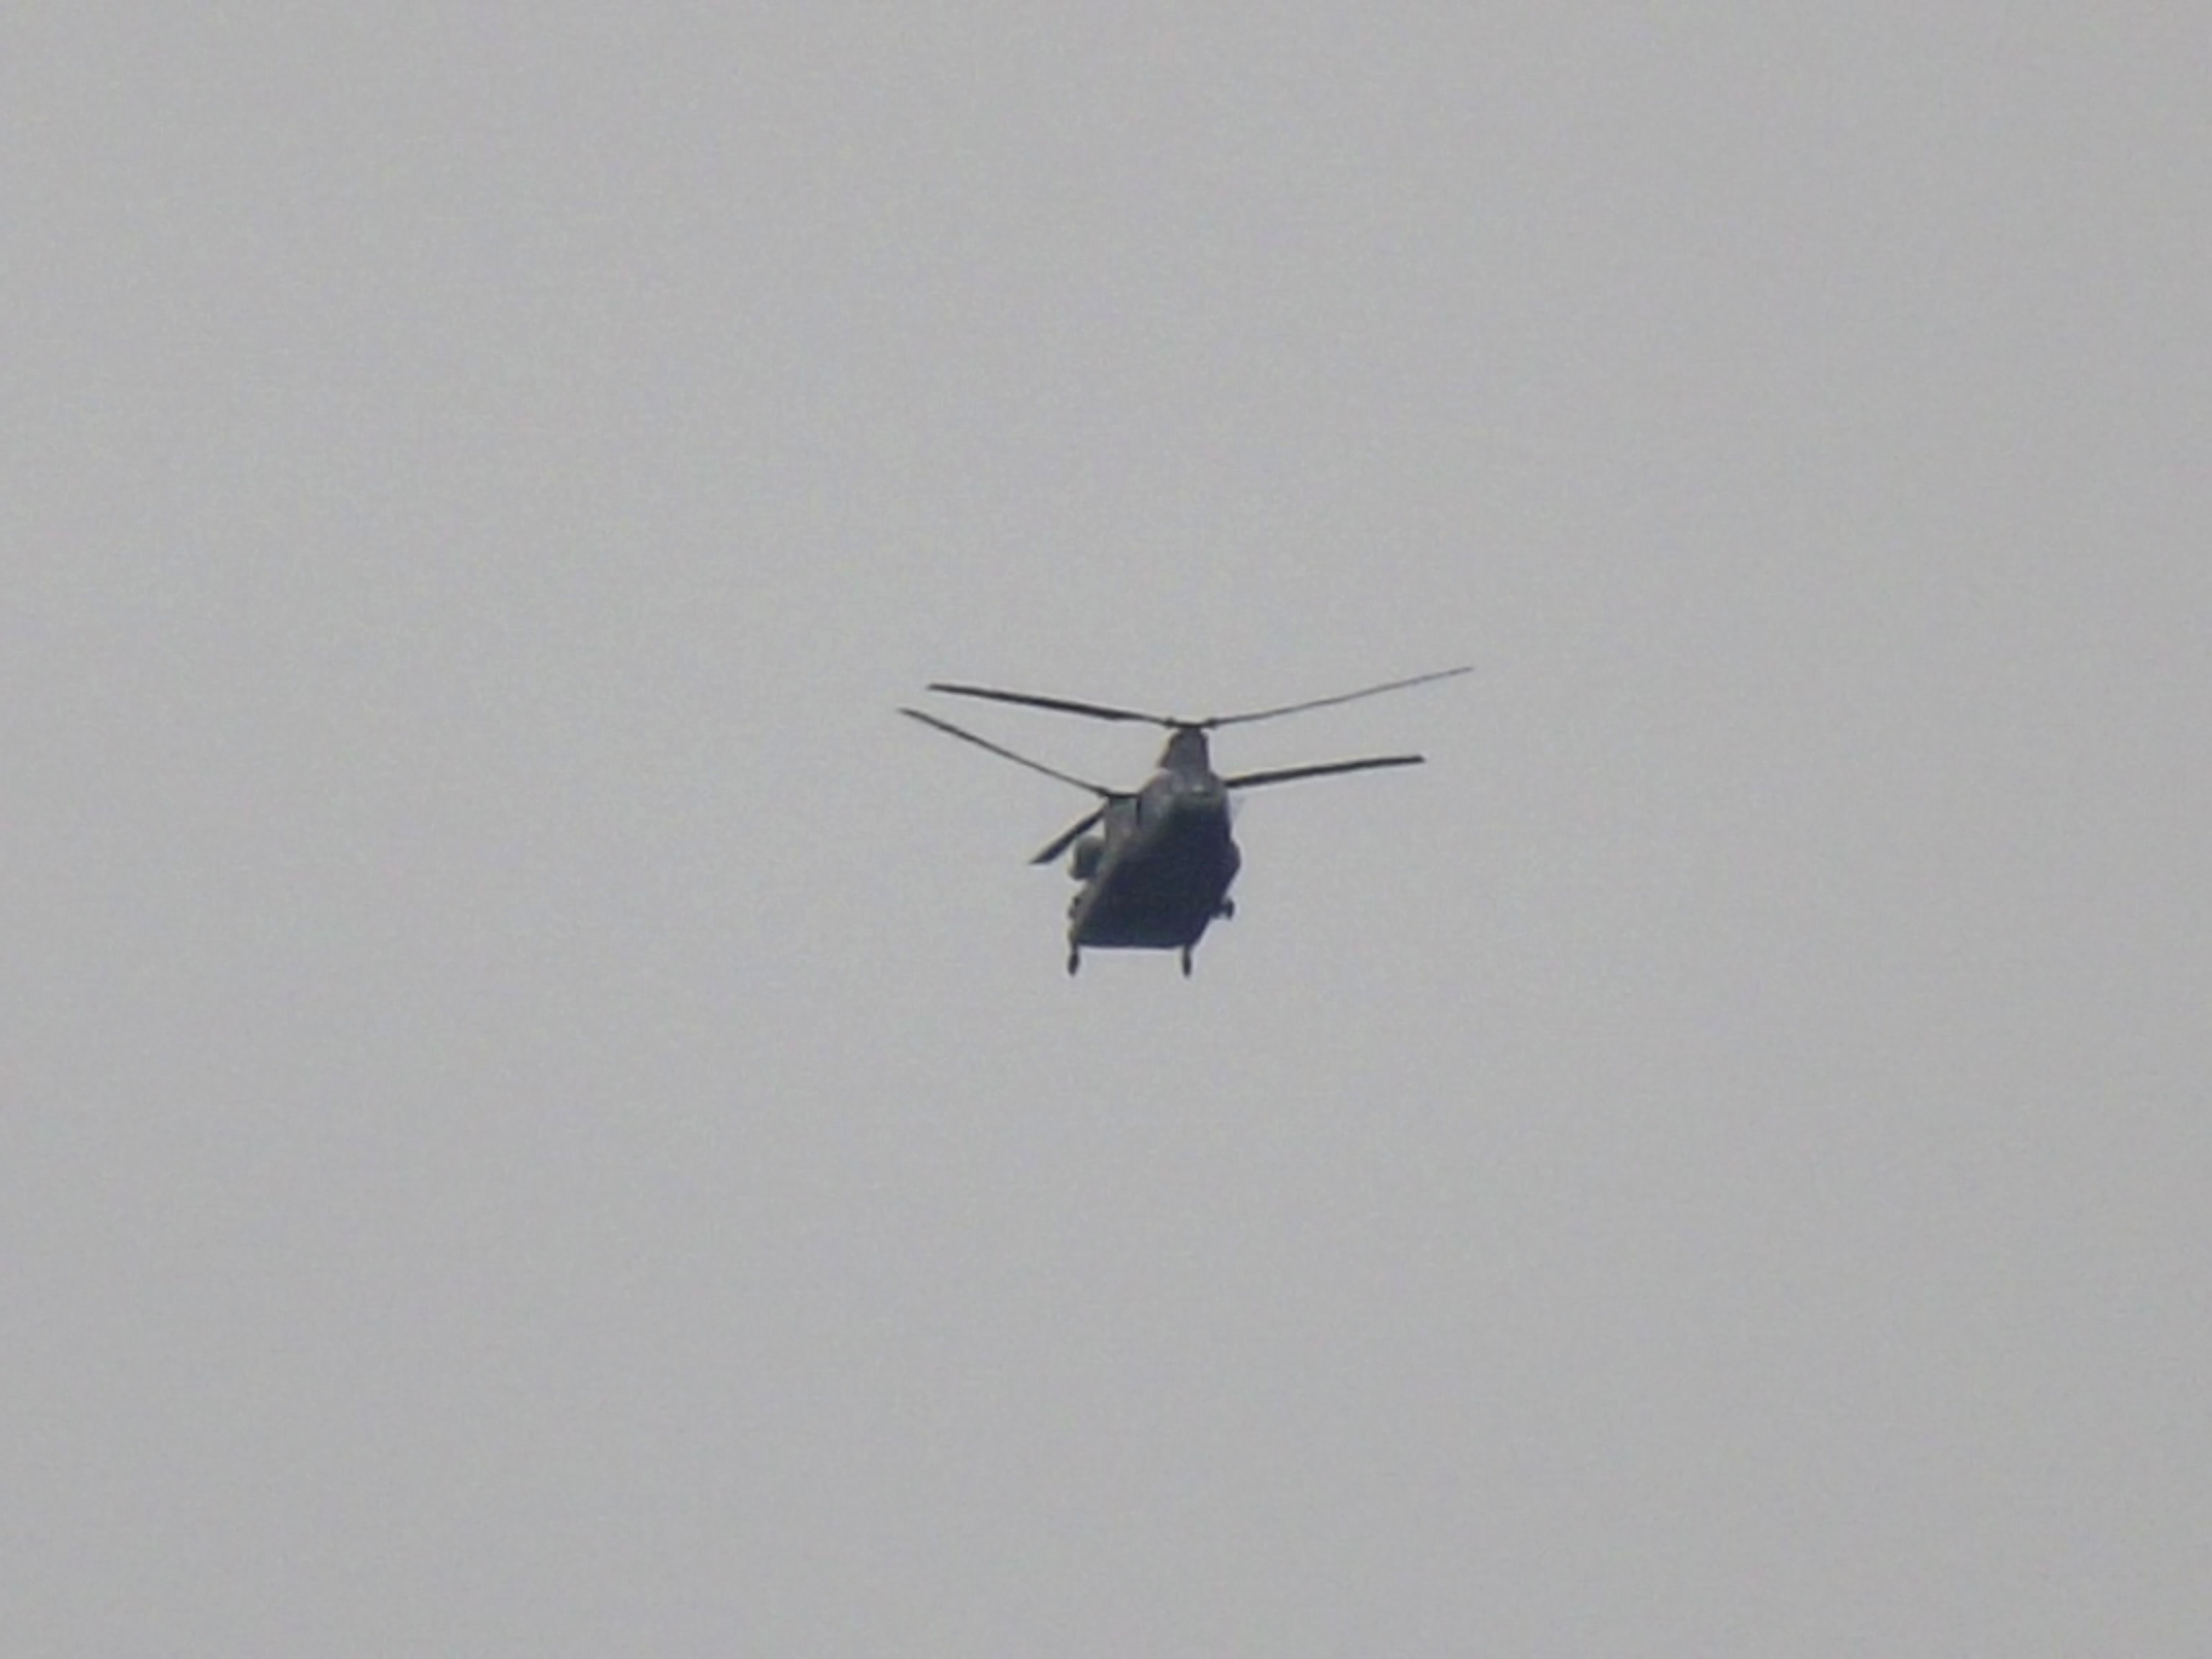 transporthubschrauber-ZA670-militaer-4238